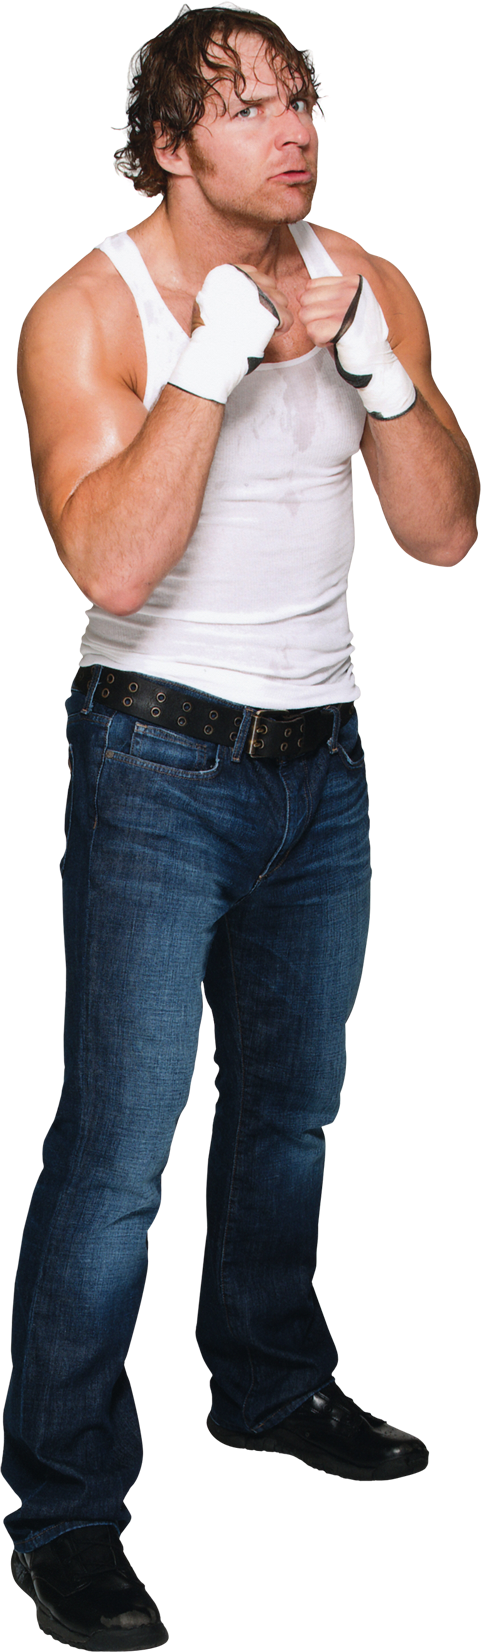 20150402012923308 Png Png Image 481 1652 Pixels Scaled 55 Wwe Dean Ambrose Dean Ambrose Gorgeous Men